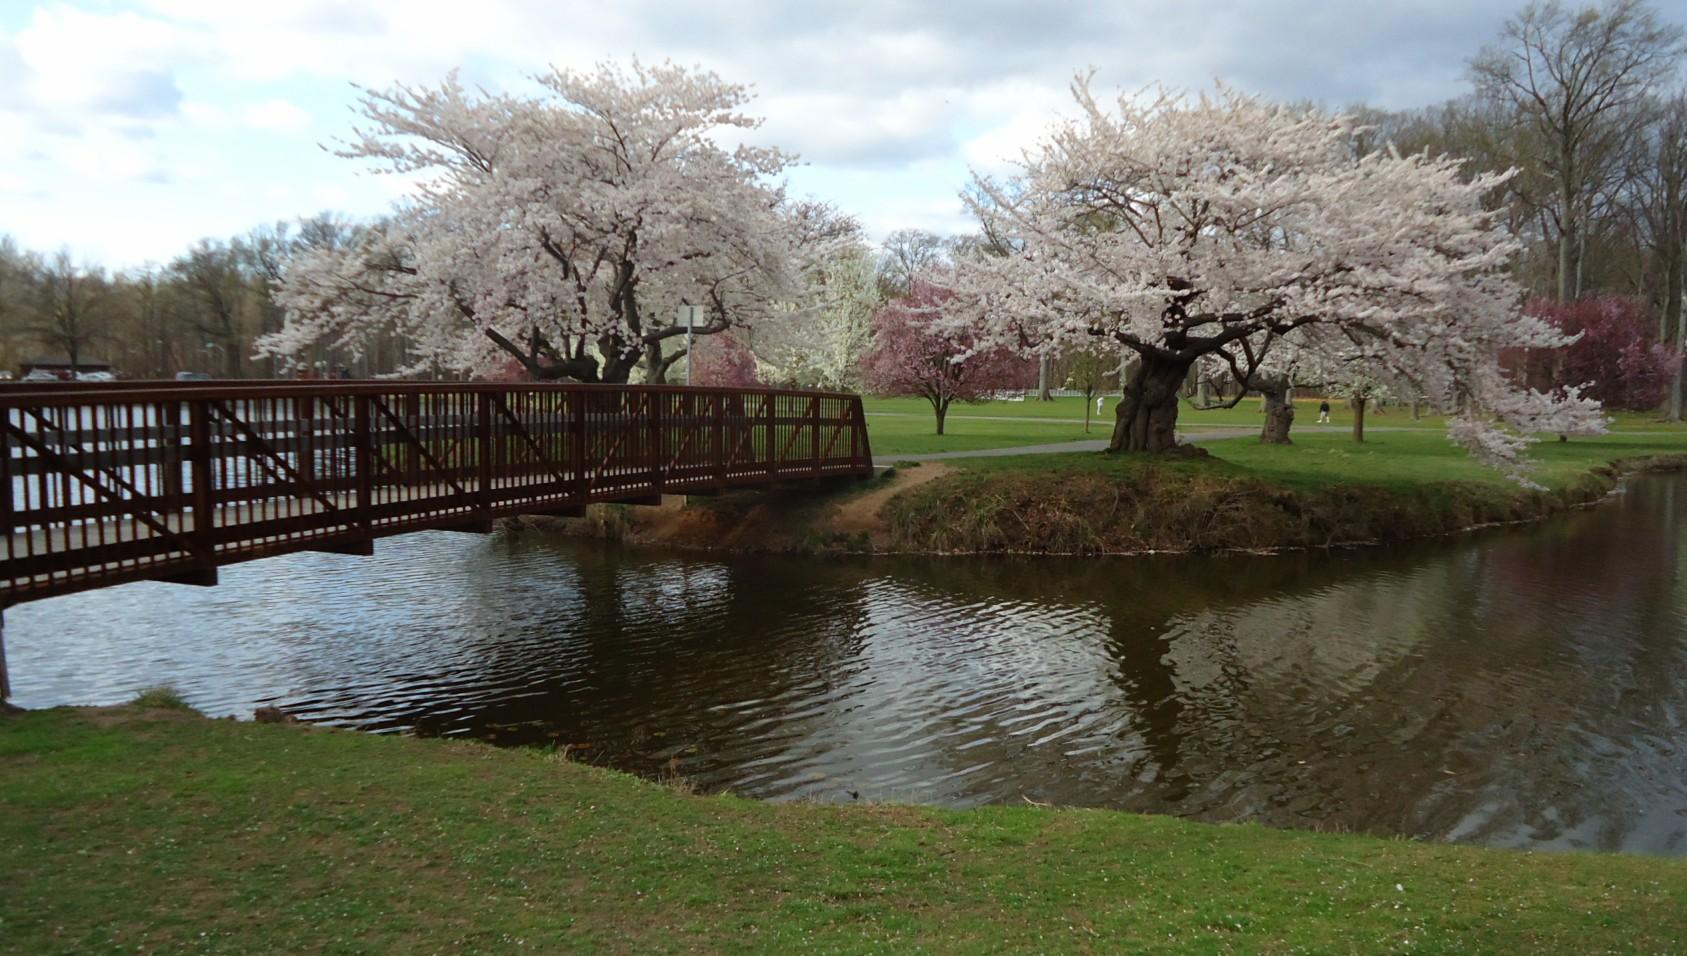 Bridge_and_trees_near_lake_in_Nomahegan_Park_NJ.jpg